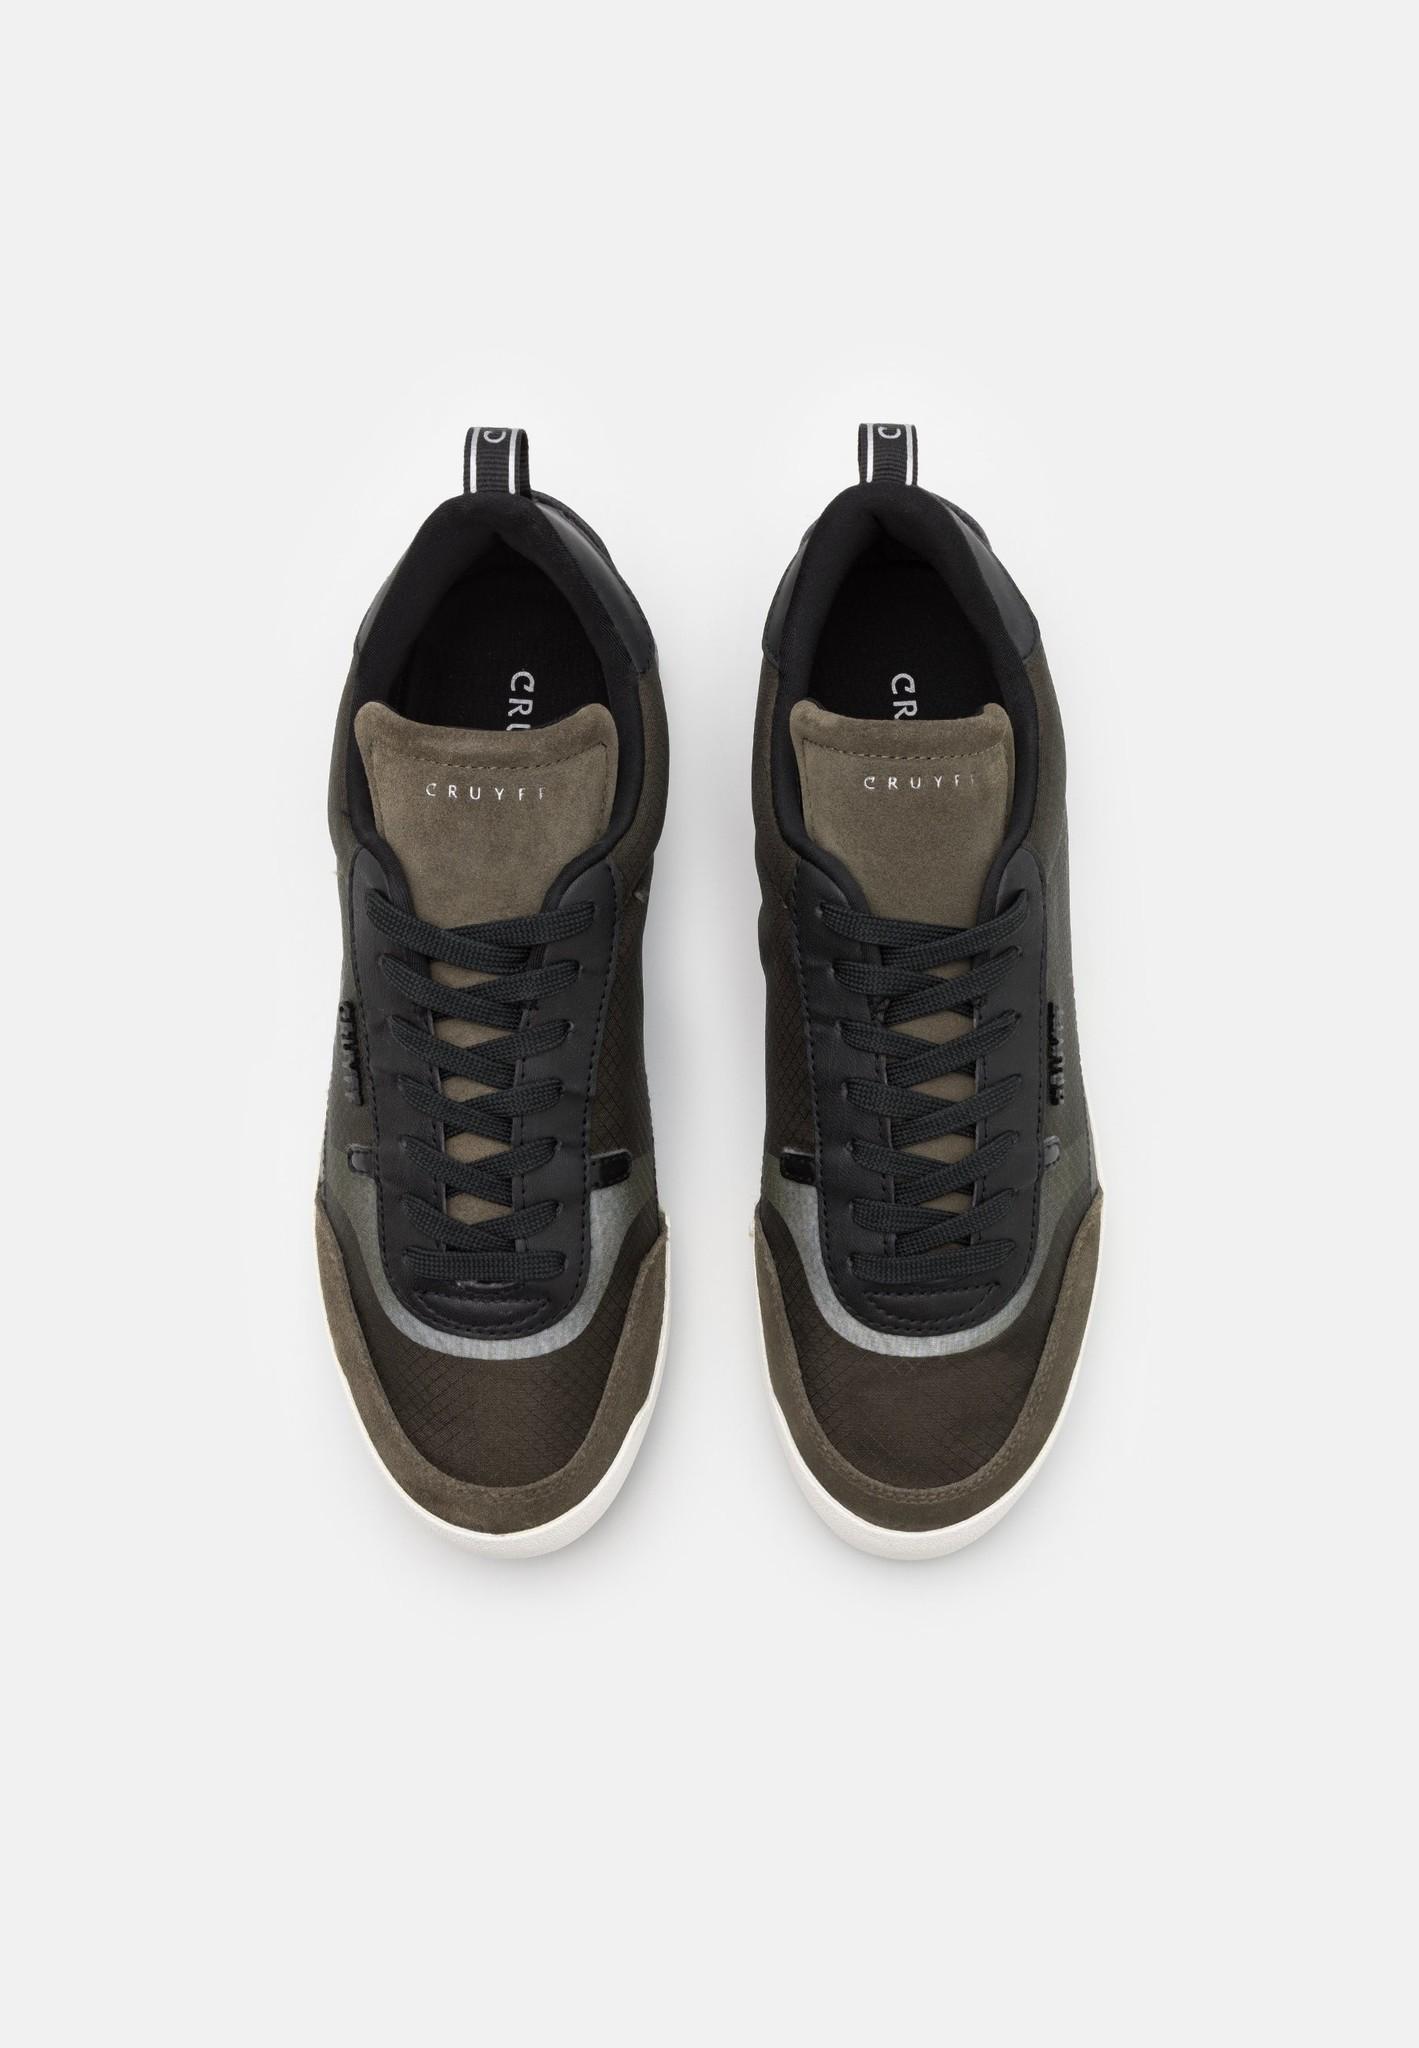 Cruyff Contra Olive/Black-4